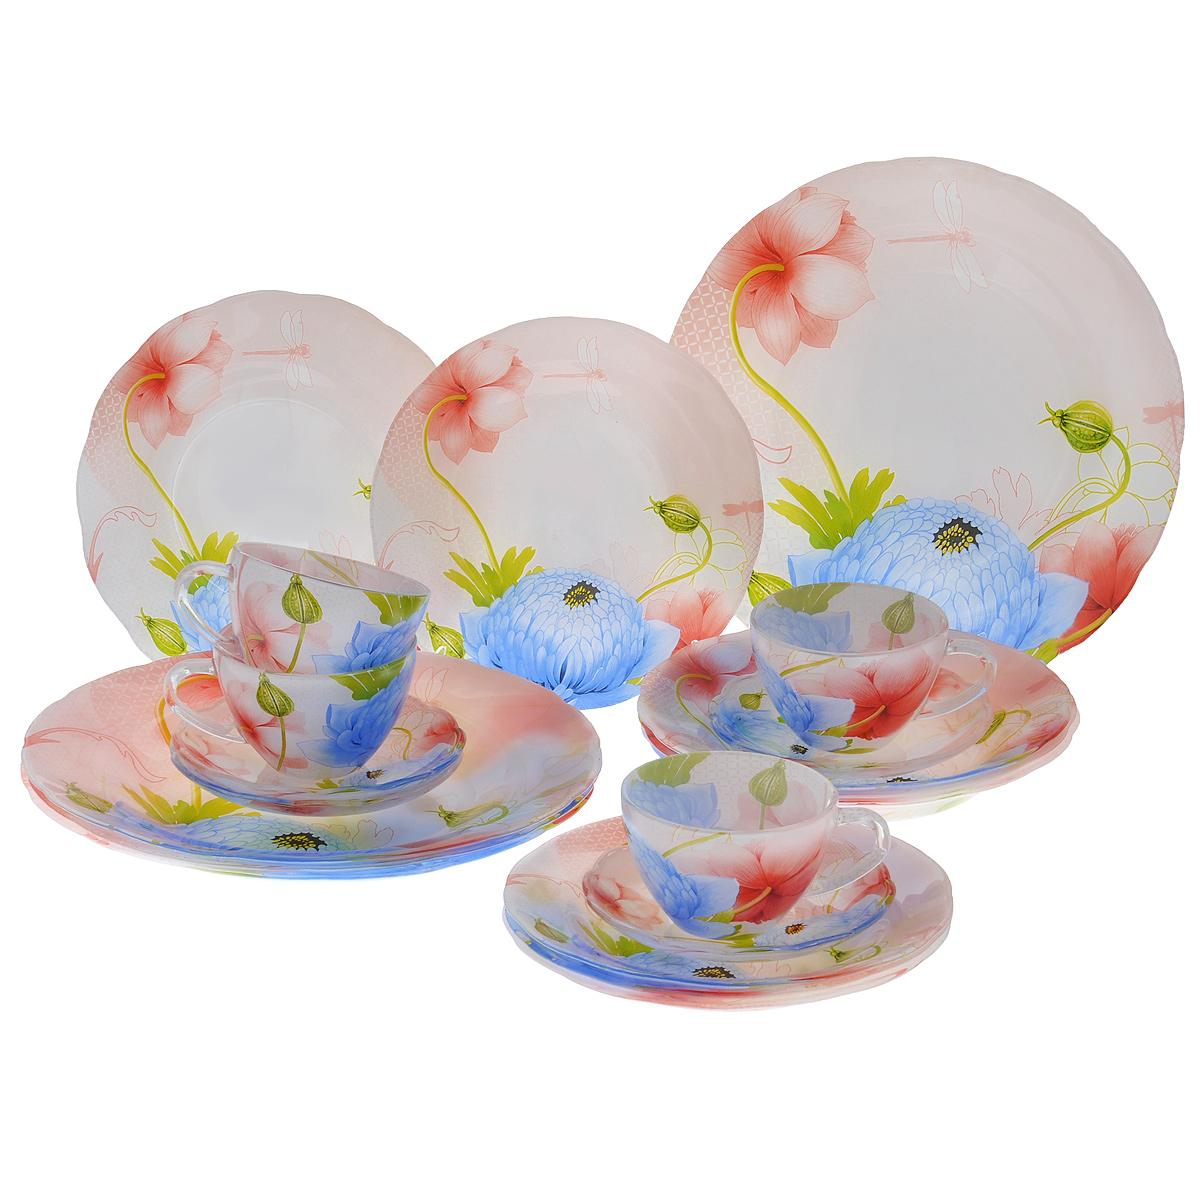 "Набор посуды ""Кувшинки"", 20 предметов, Porcelain Industry"